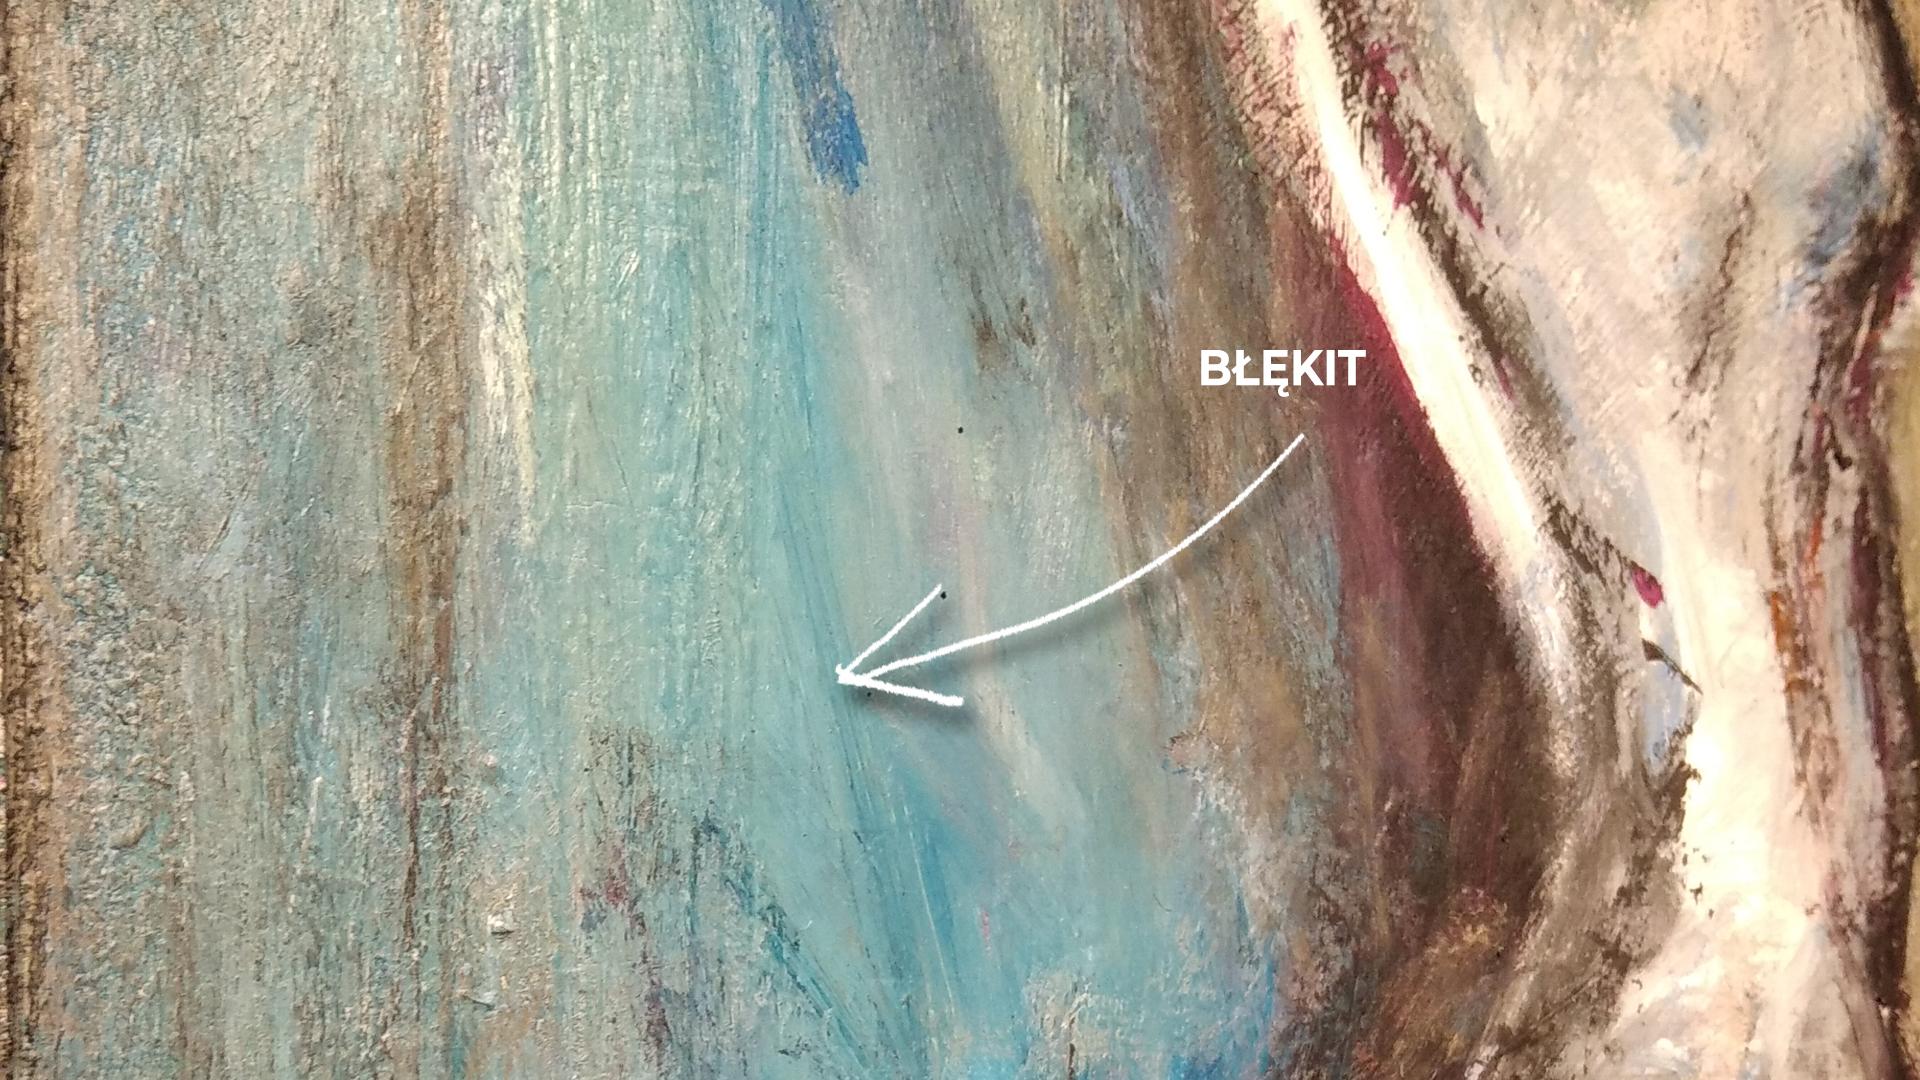 Obraz Akrylowy Taniec 60 x 80 cm detal 2